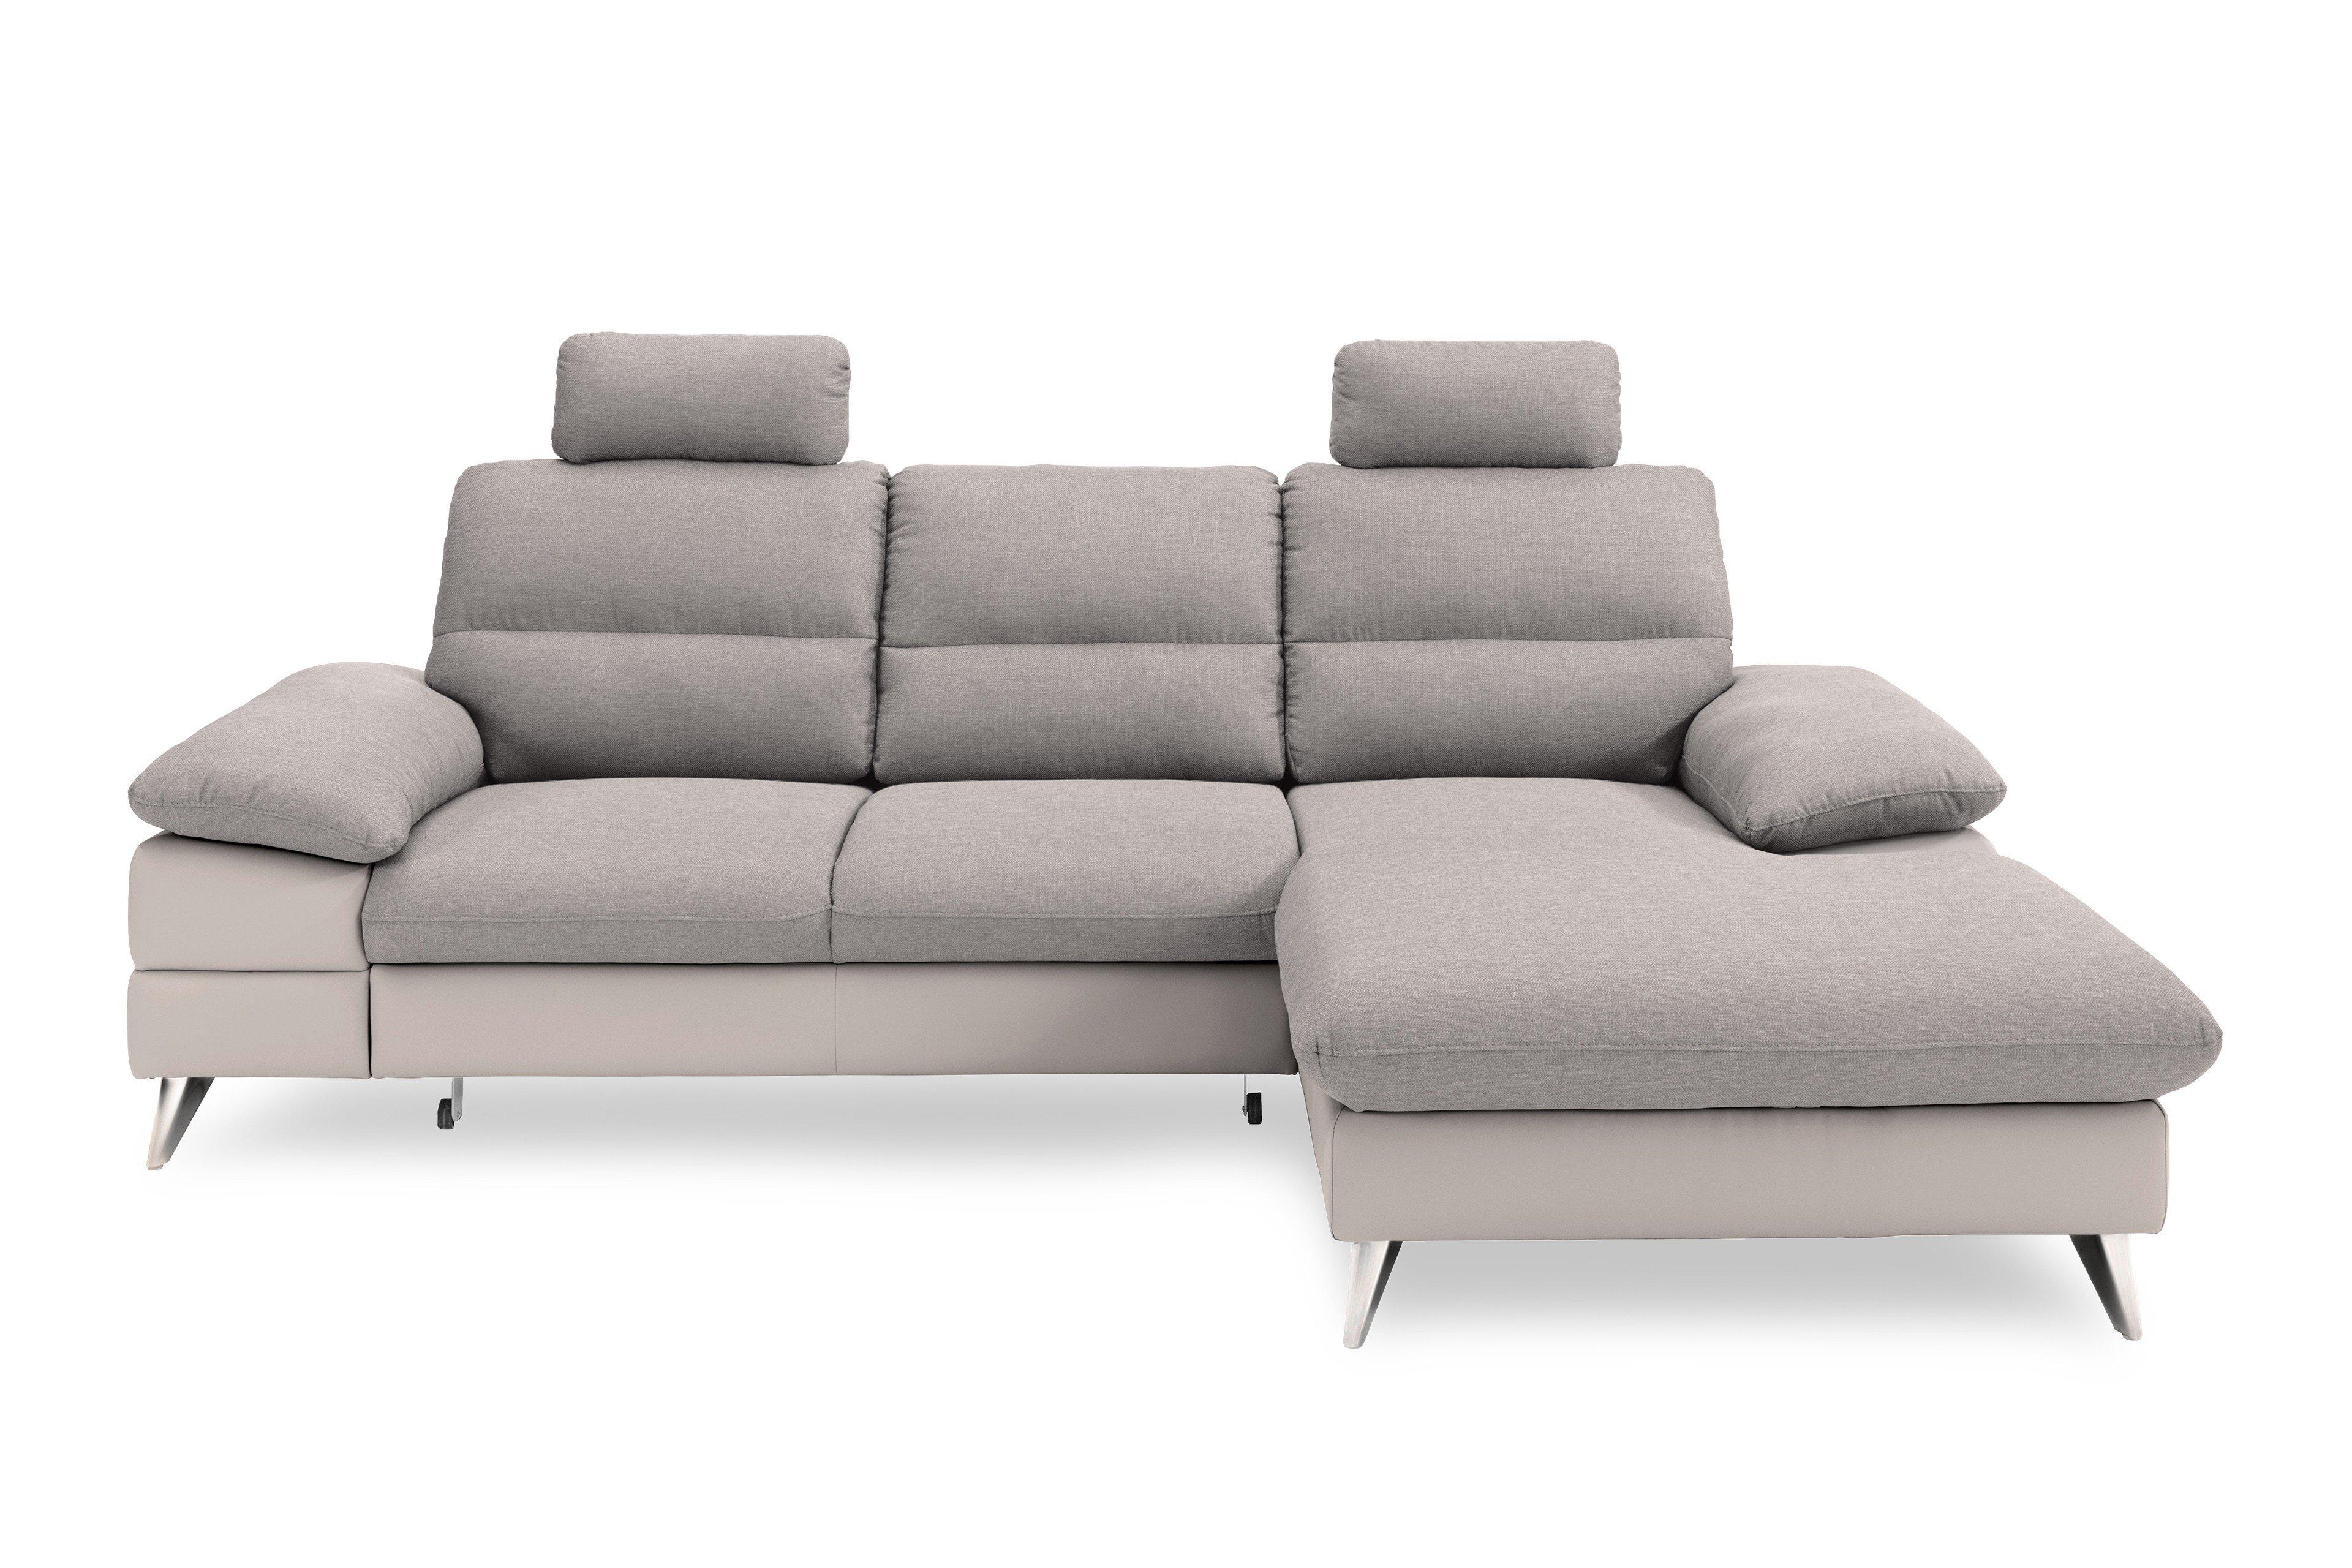 cotta ella polstergarnitur in grau m bel letz ihr online shop. Black Bedroom Furniture Sets. Home Design Ideas